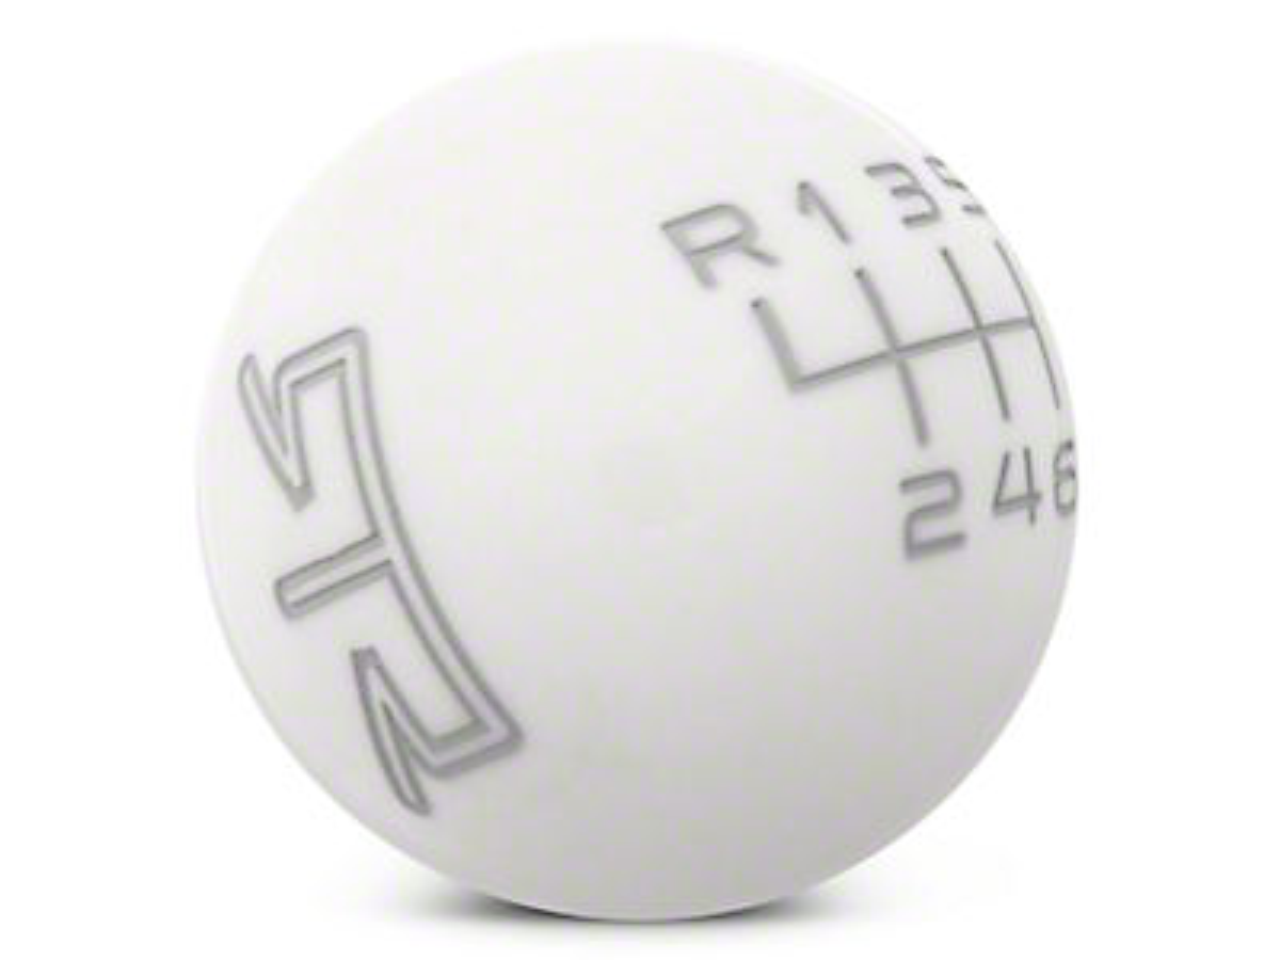 RTR White Shift Knob - Gray Engraving (11-14 GT, V6)